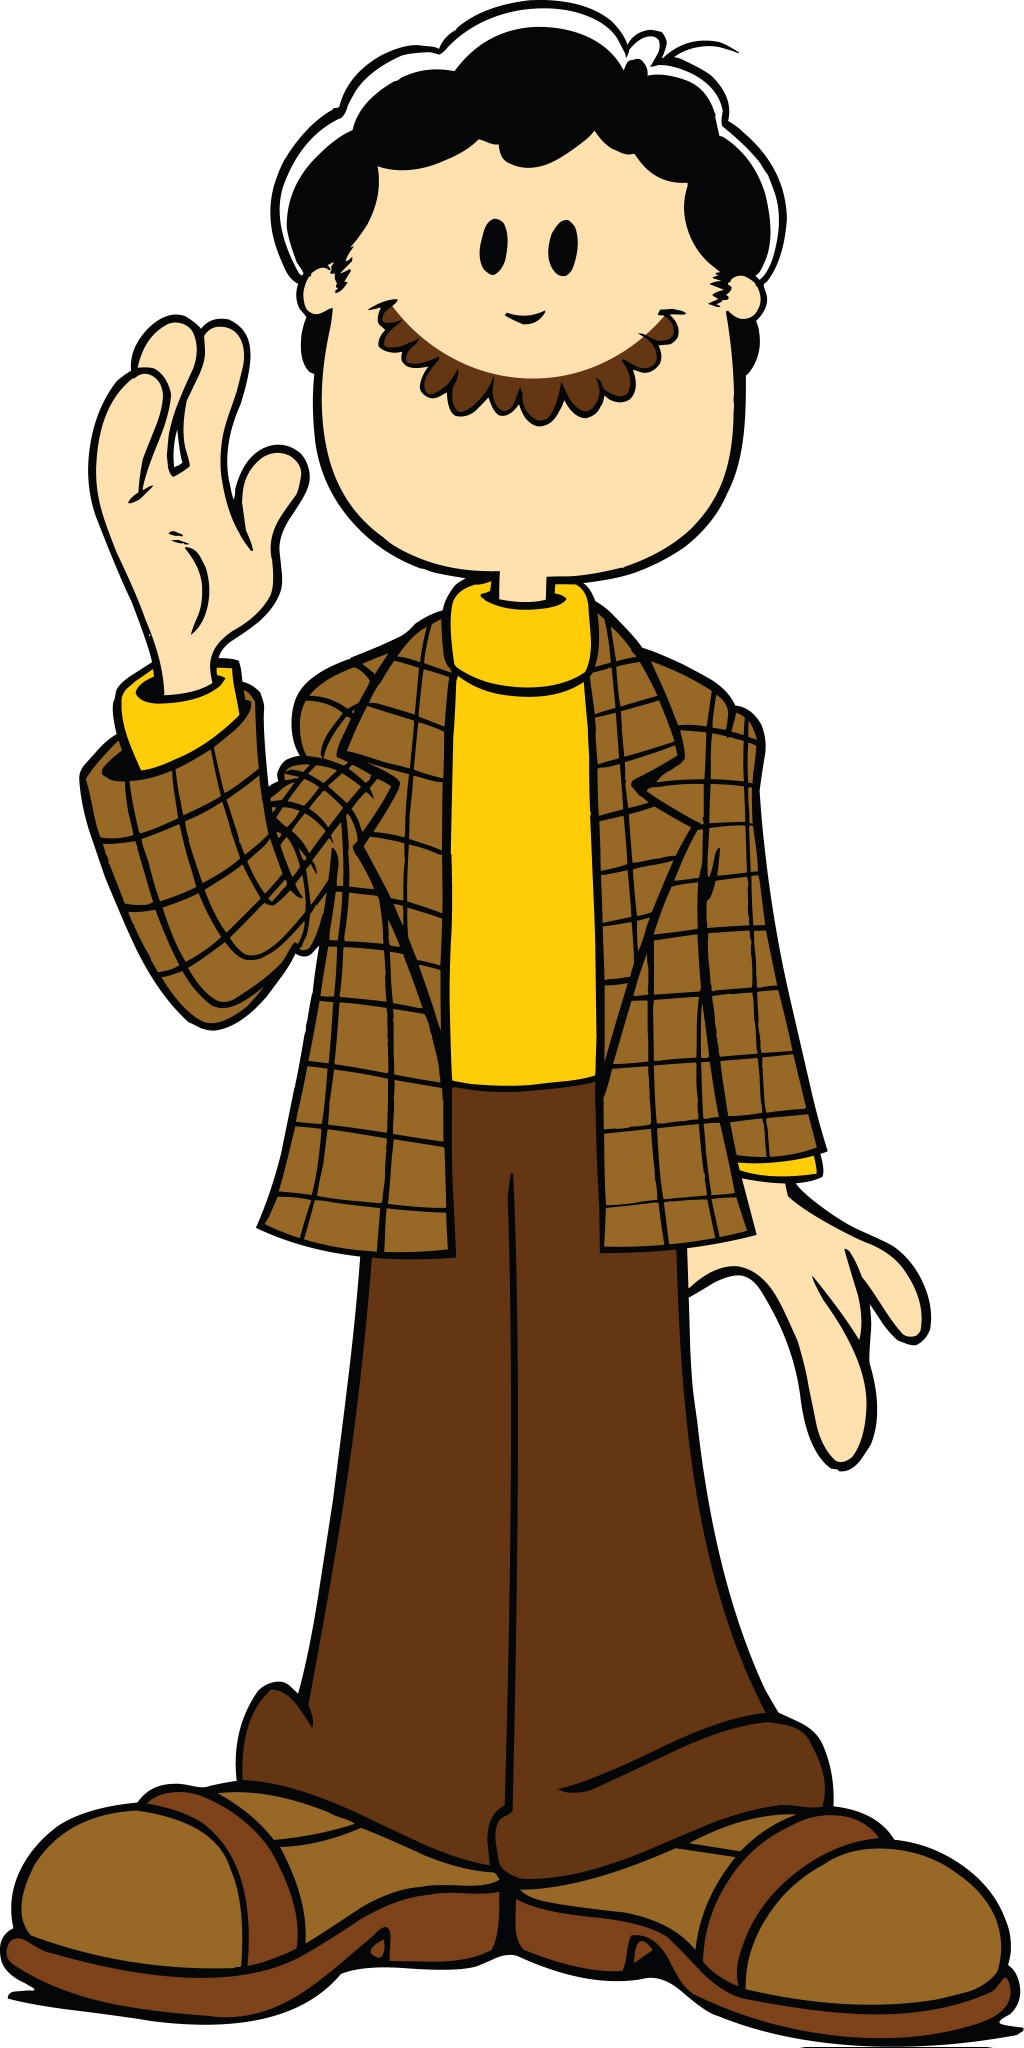 Category The Garfield Show Characters Garfield Wiki Fandom